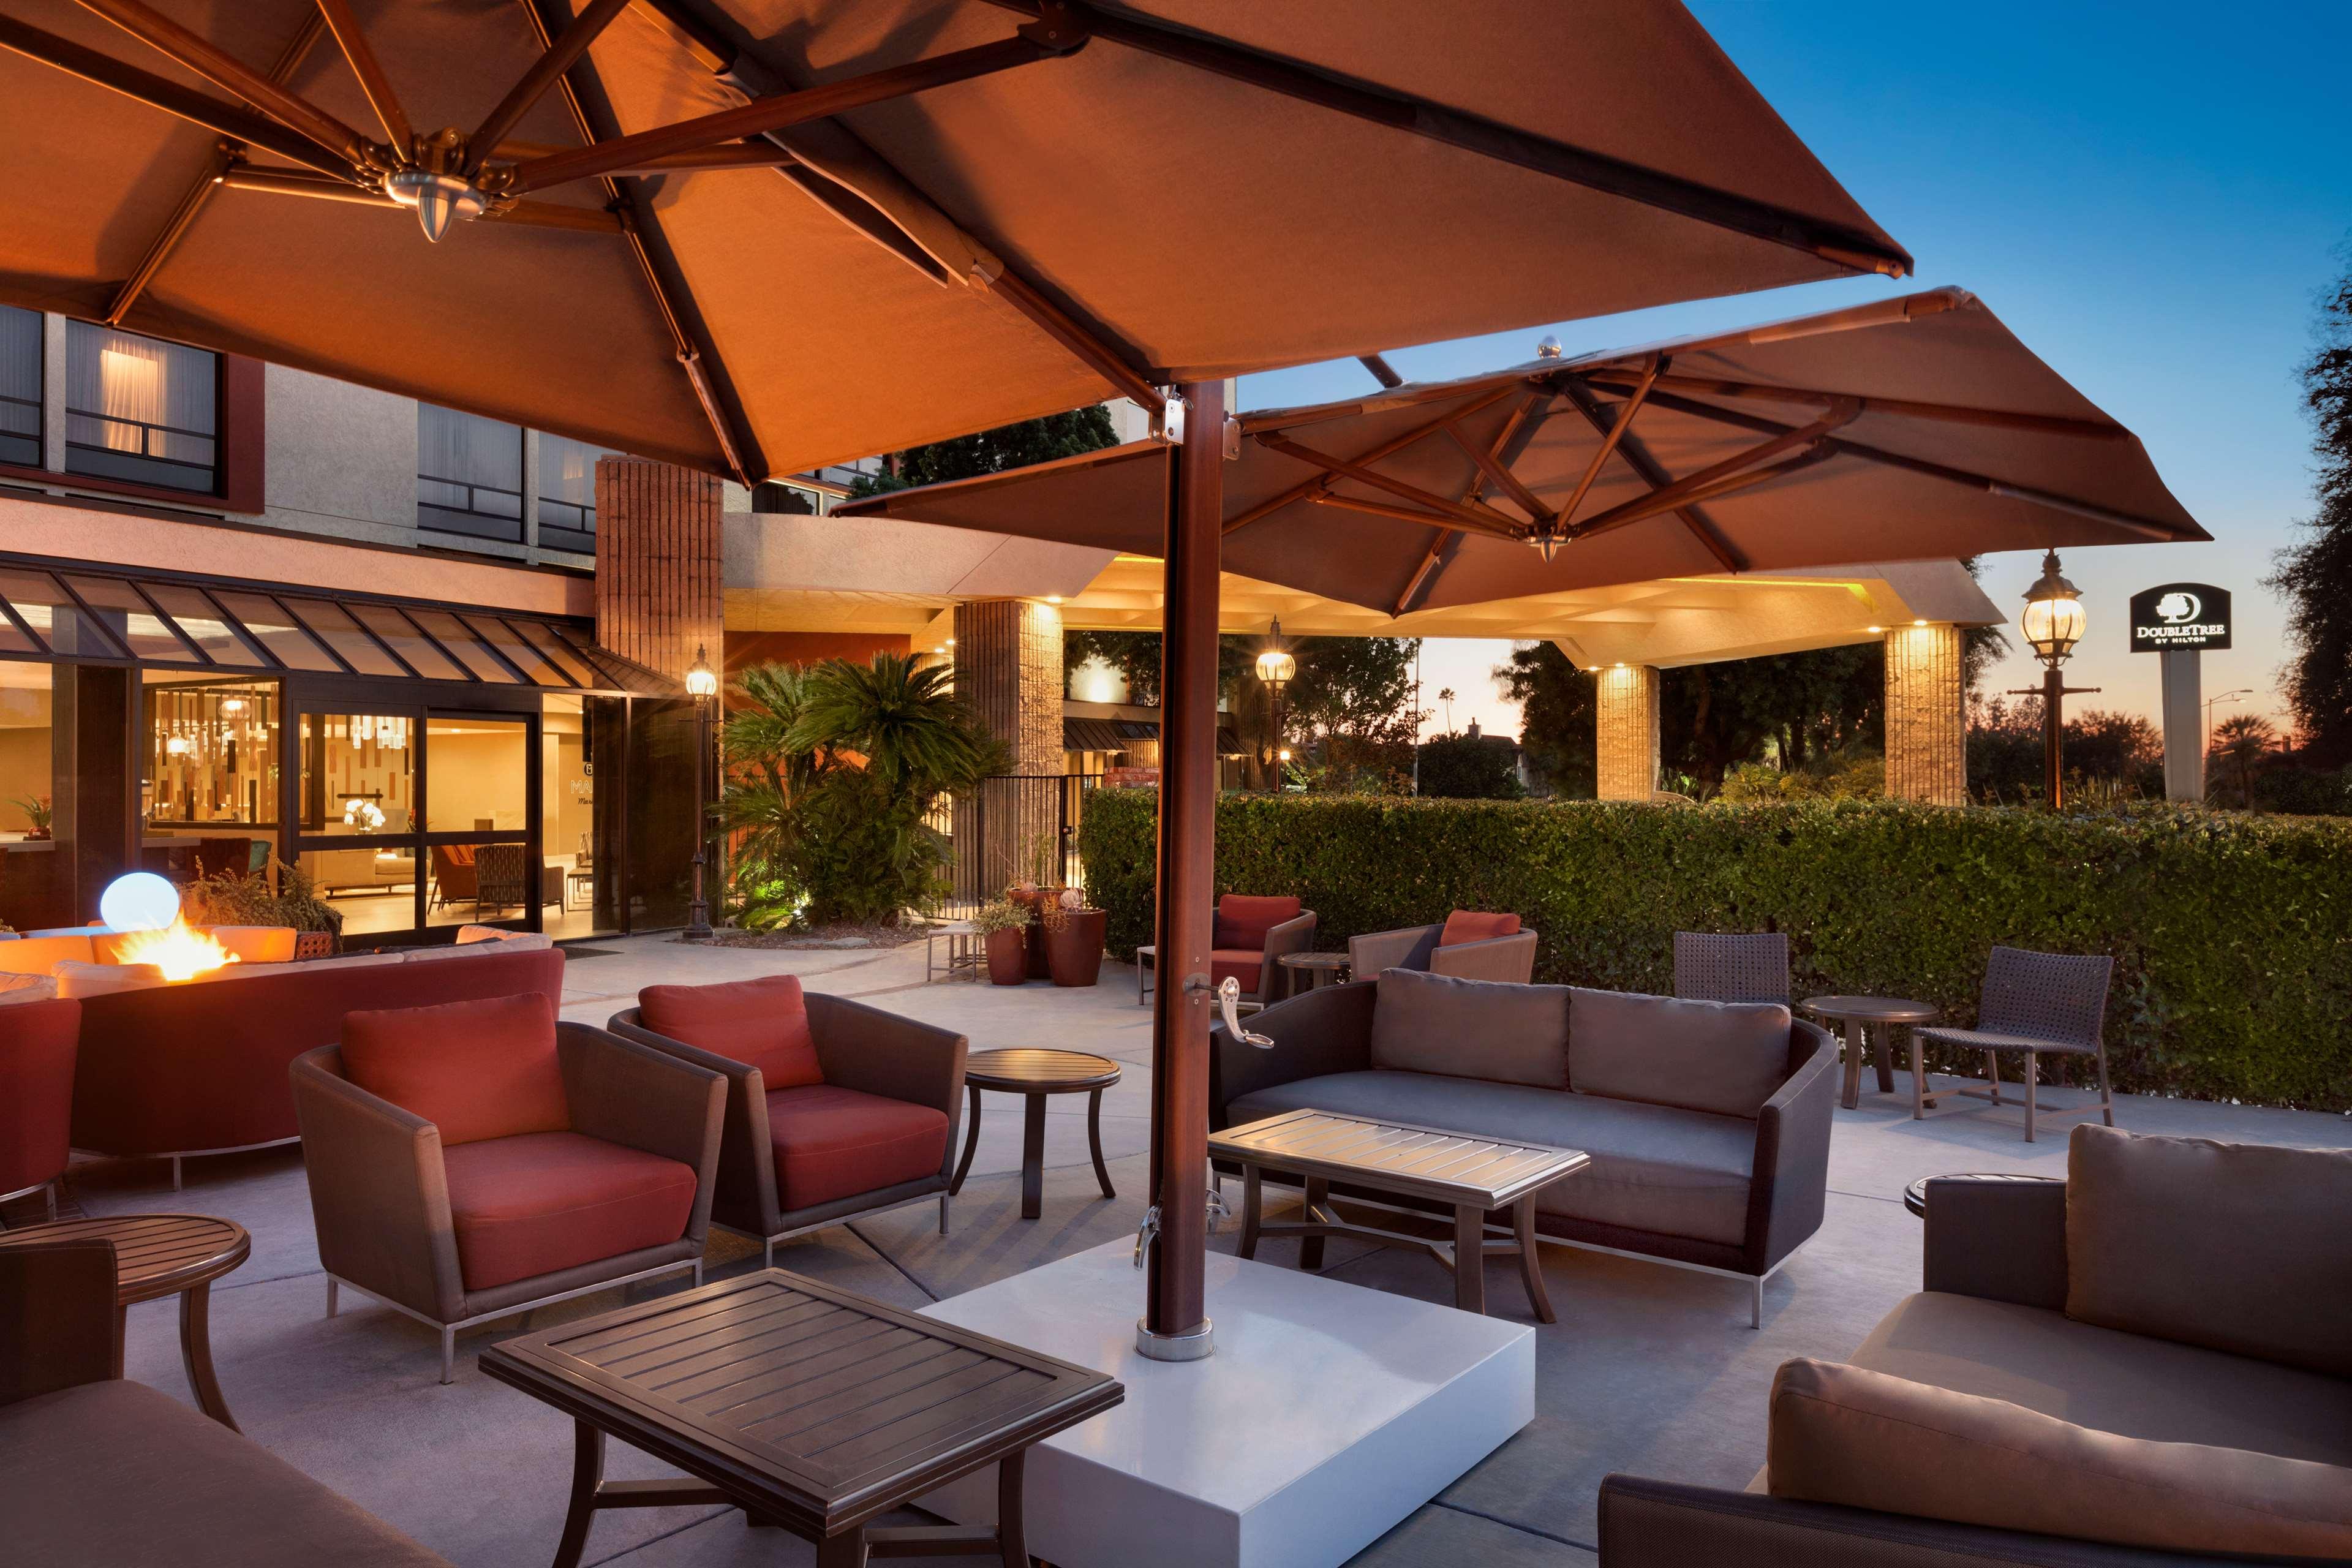 DoubleTree by Hilton Hotel San Bernardino image 1